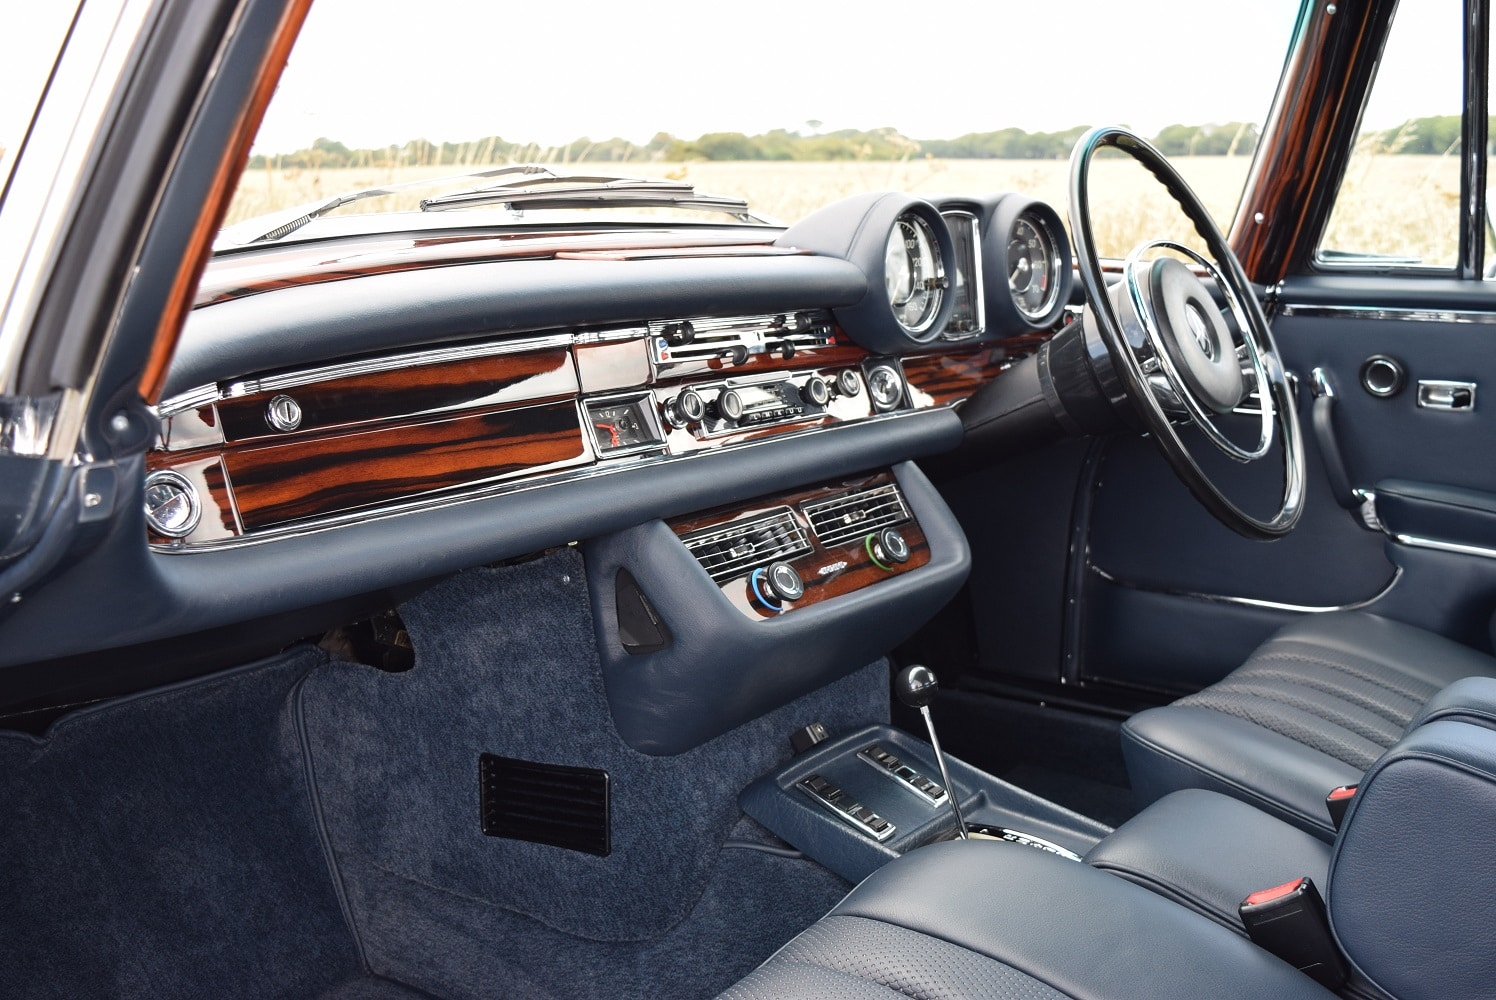 Interior view of Mercedes-Benz 280SE/9 3.5 CPE